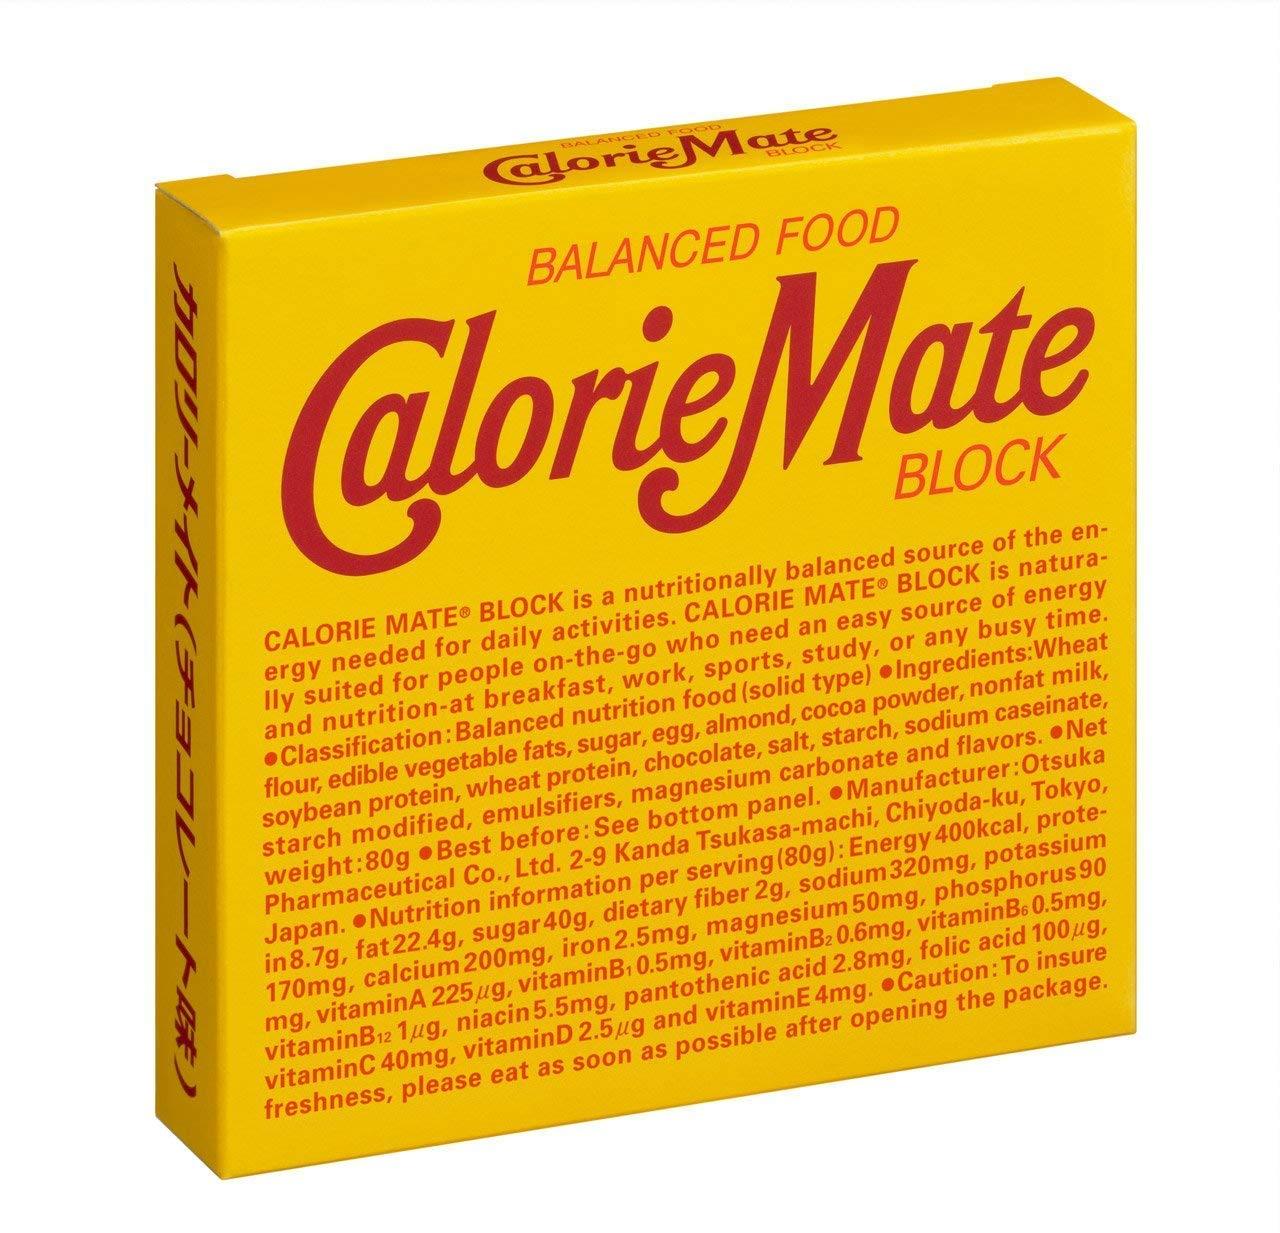 Image of カロリーメイト ブロック チョコレート 4本